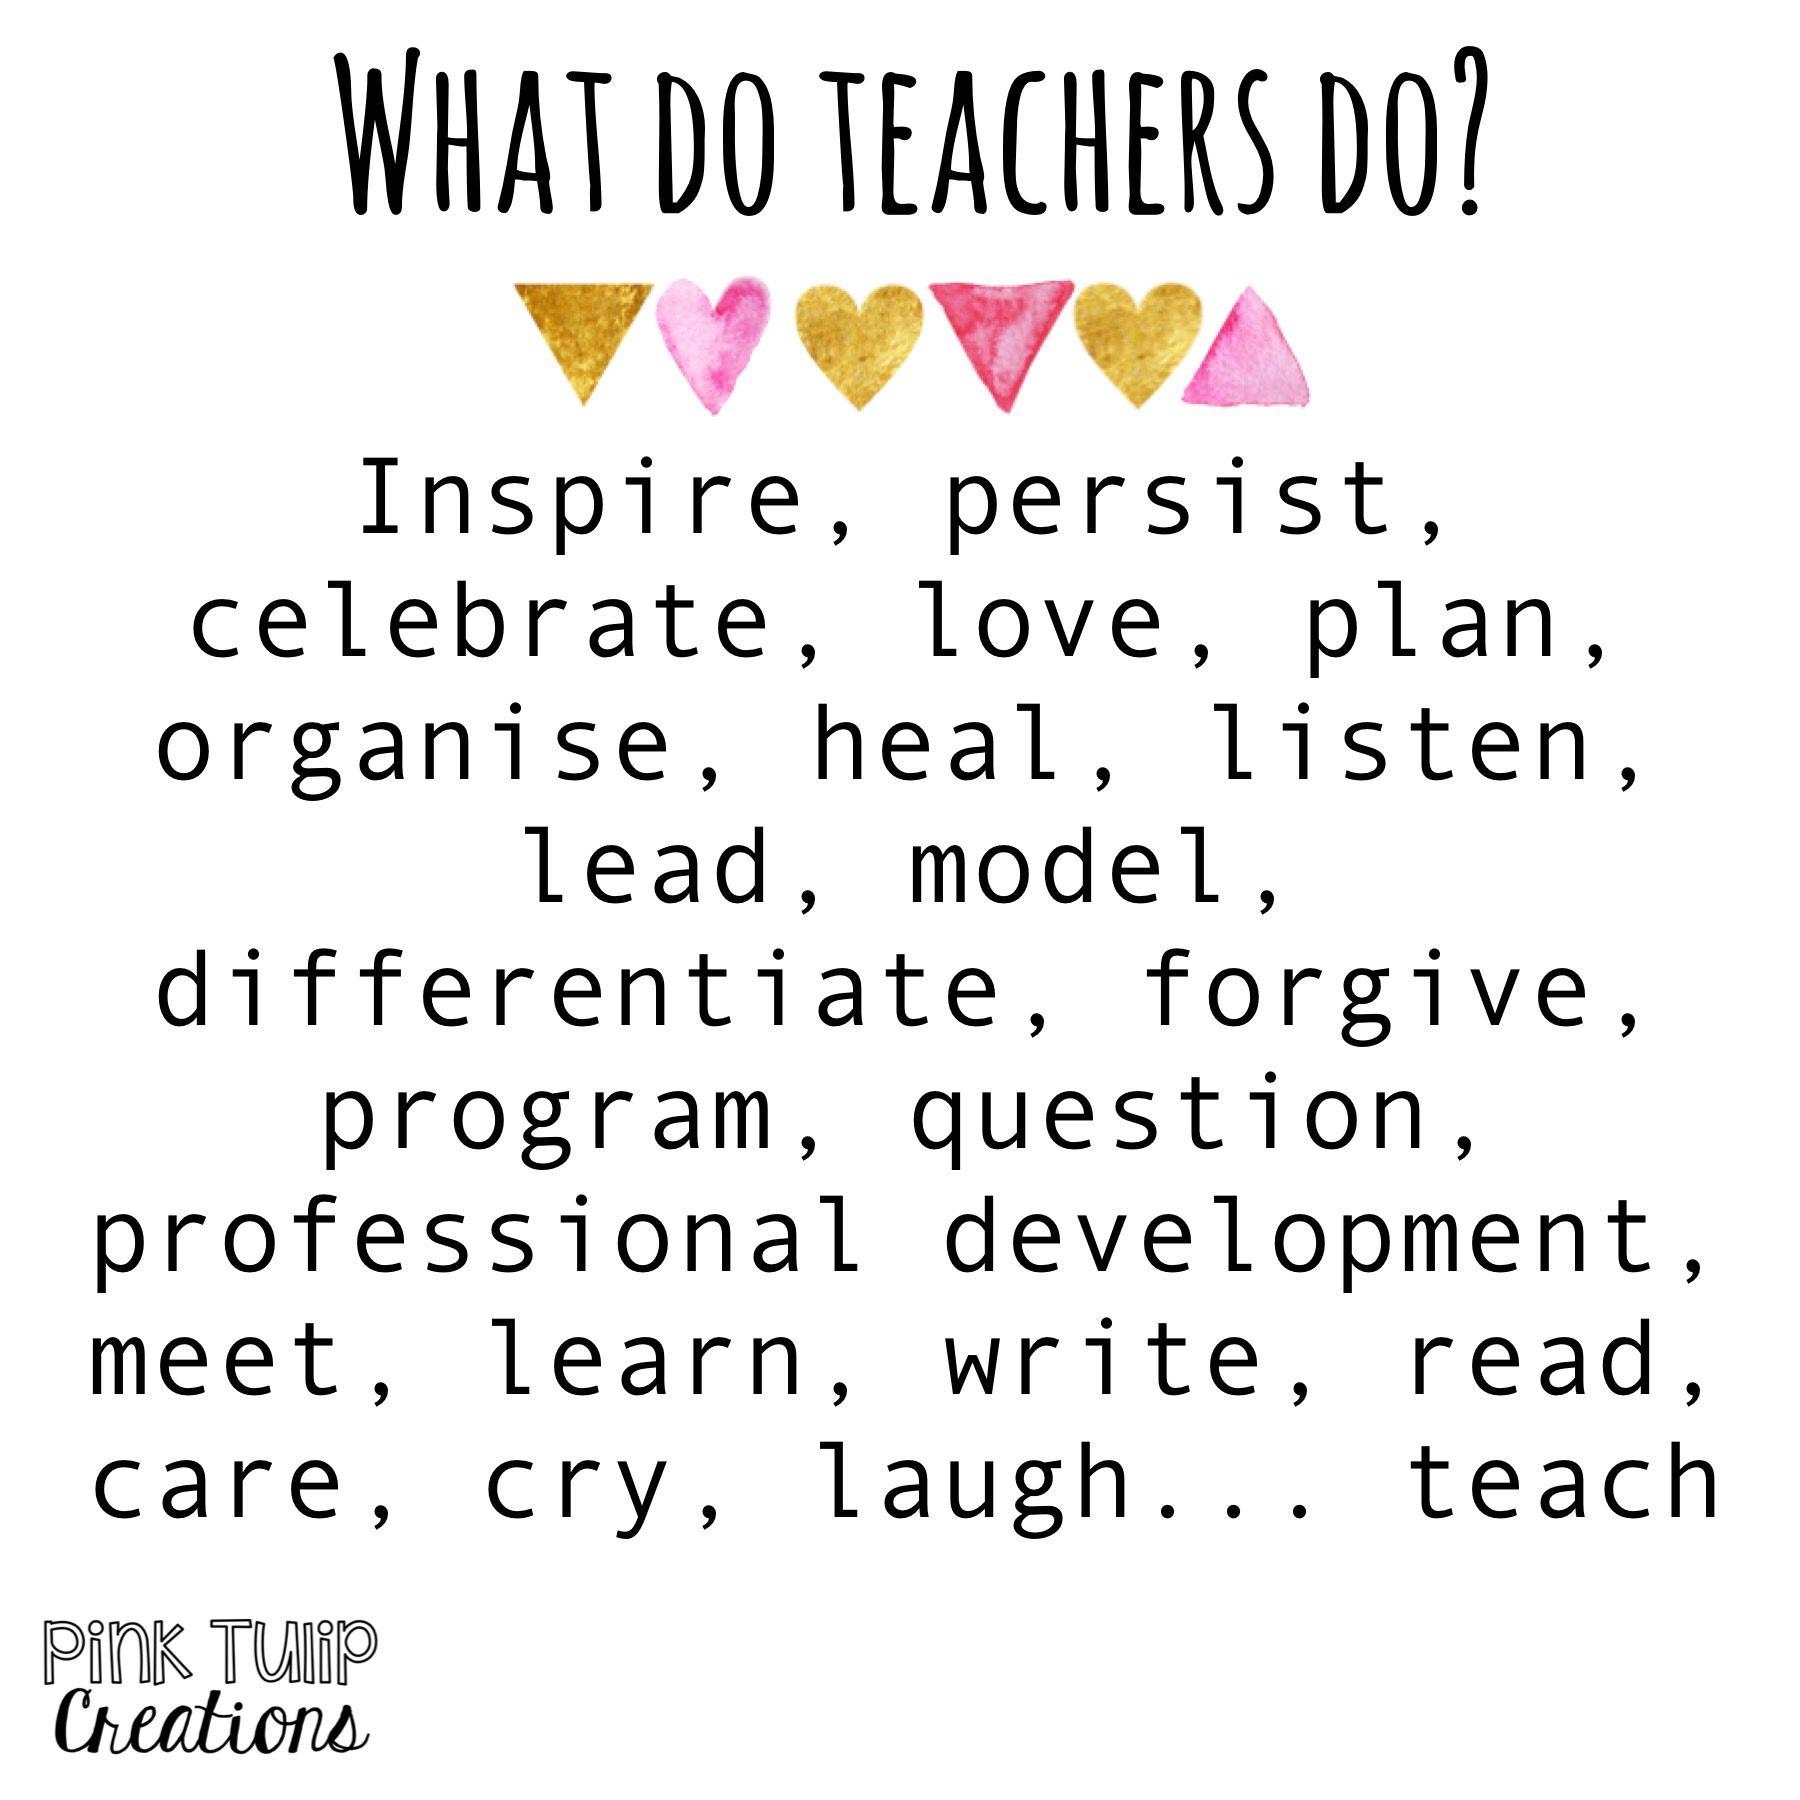 What do teachers do? Inspire, persist, celebrate, love